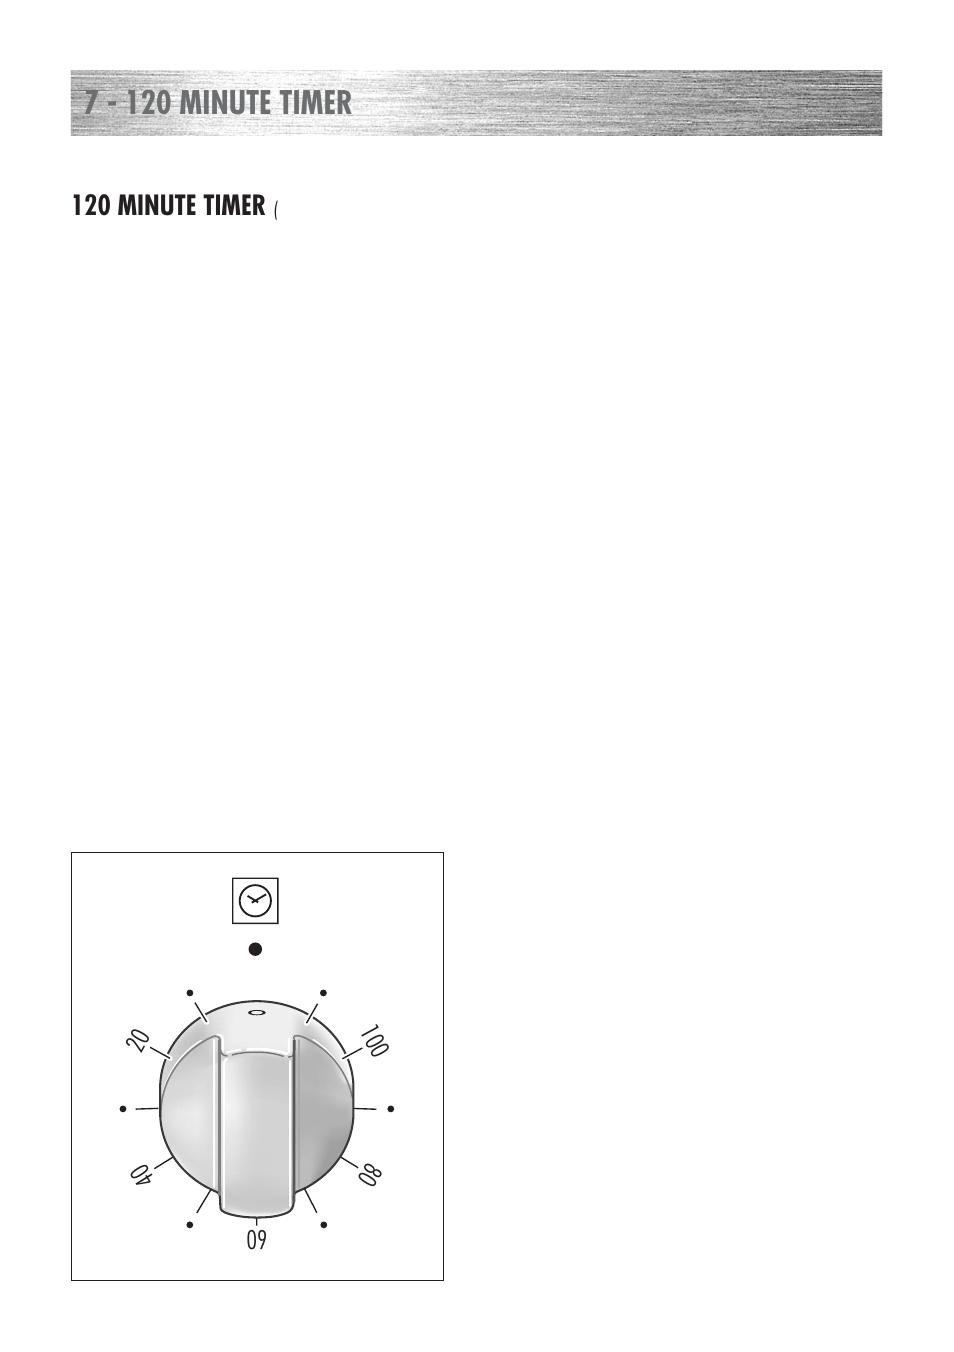 7 120 minute timer kenwood ck 300 user manual page 20 48